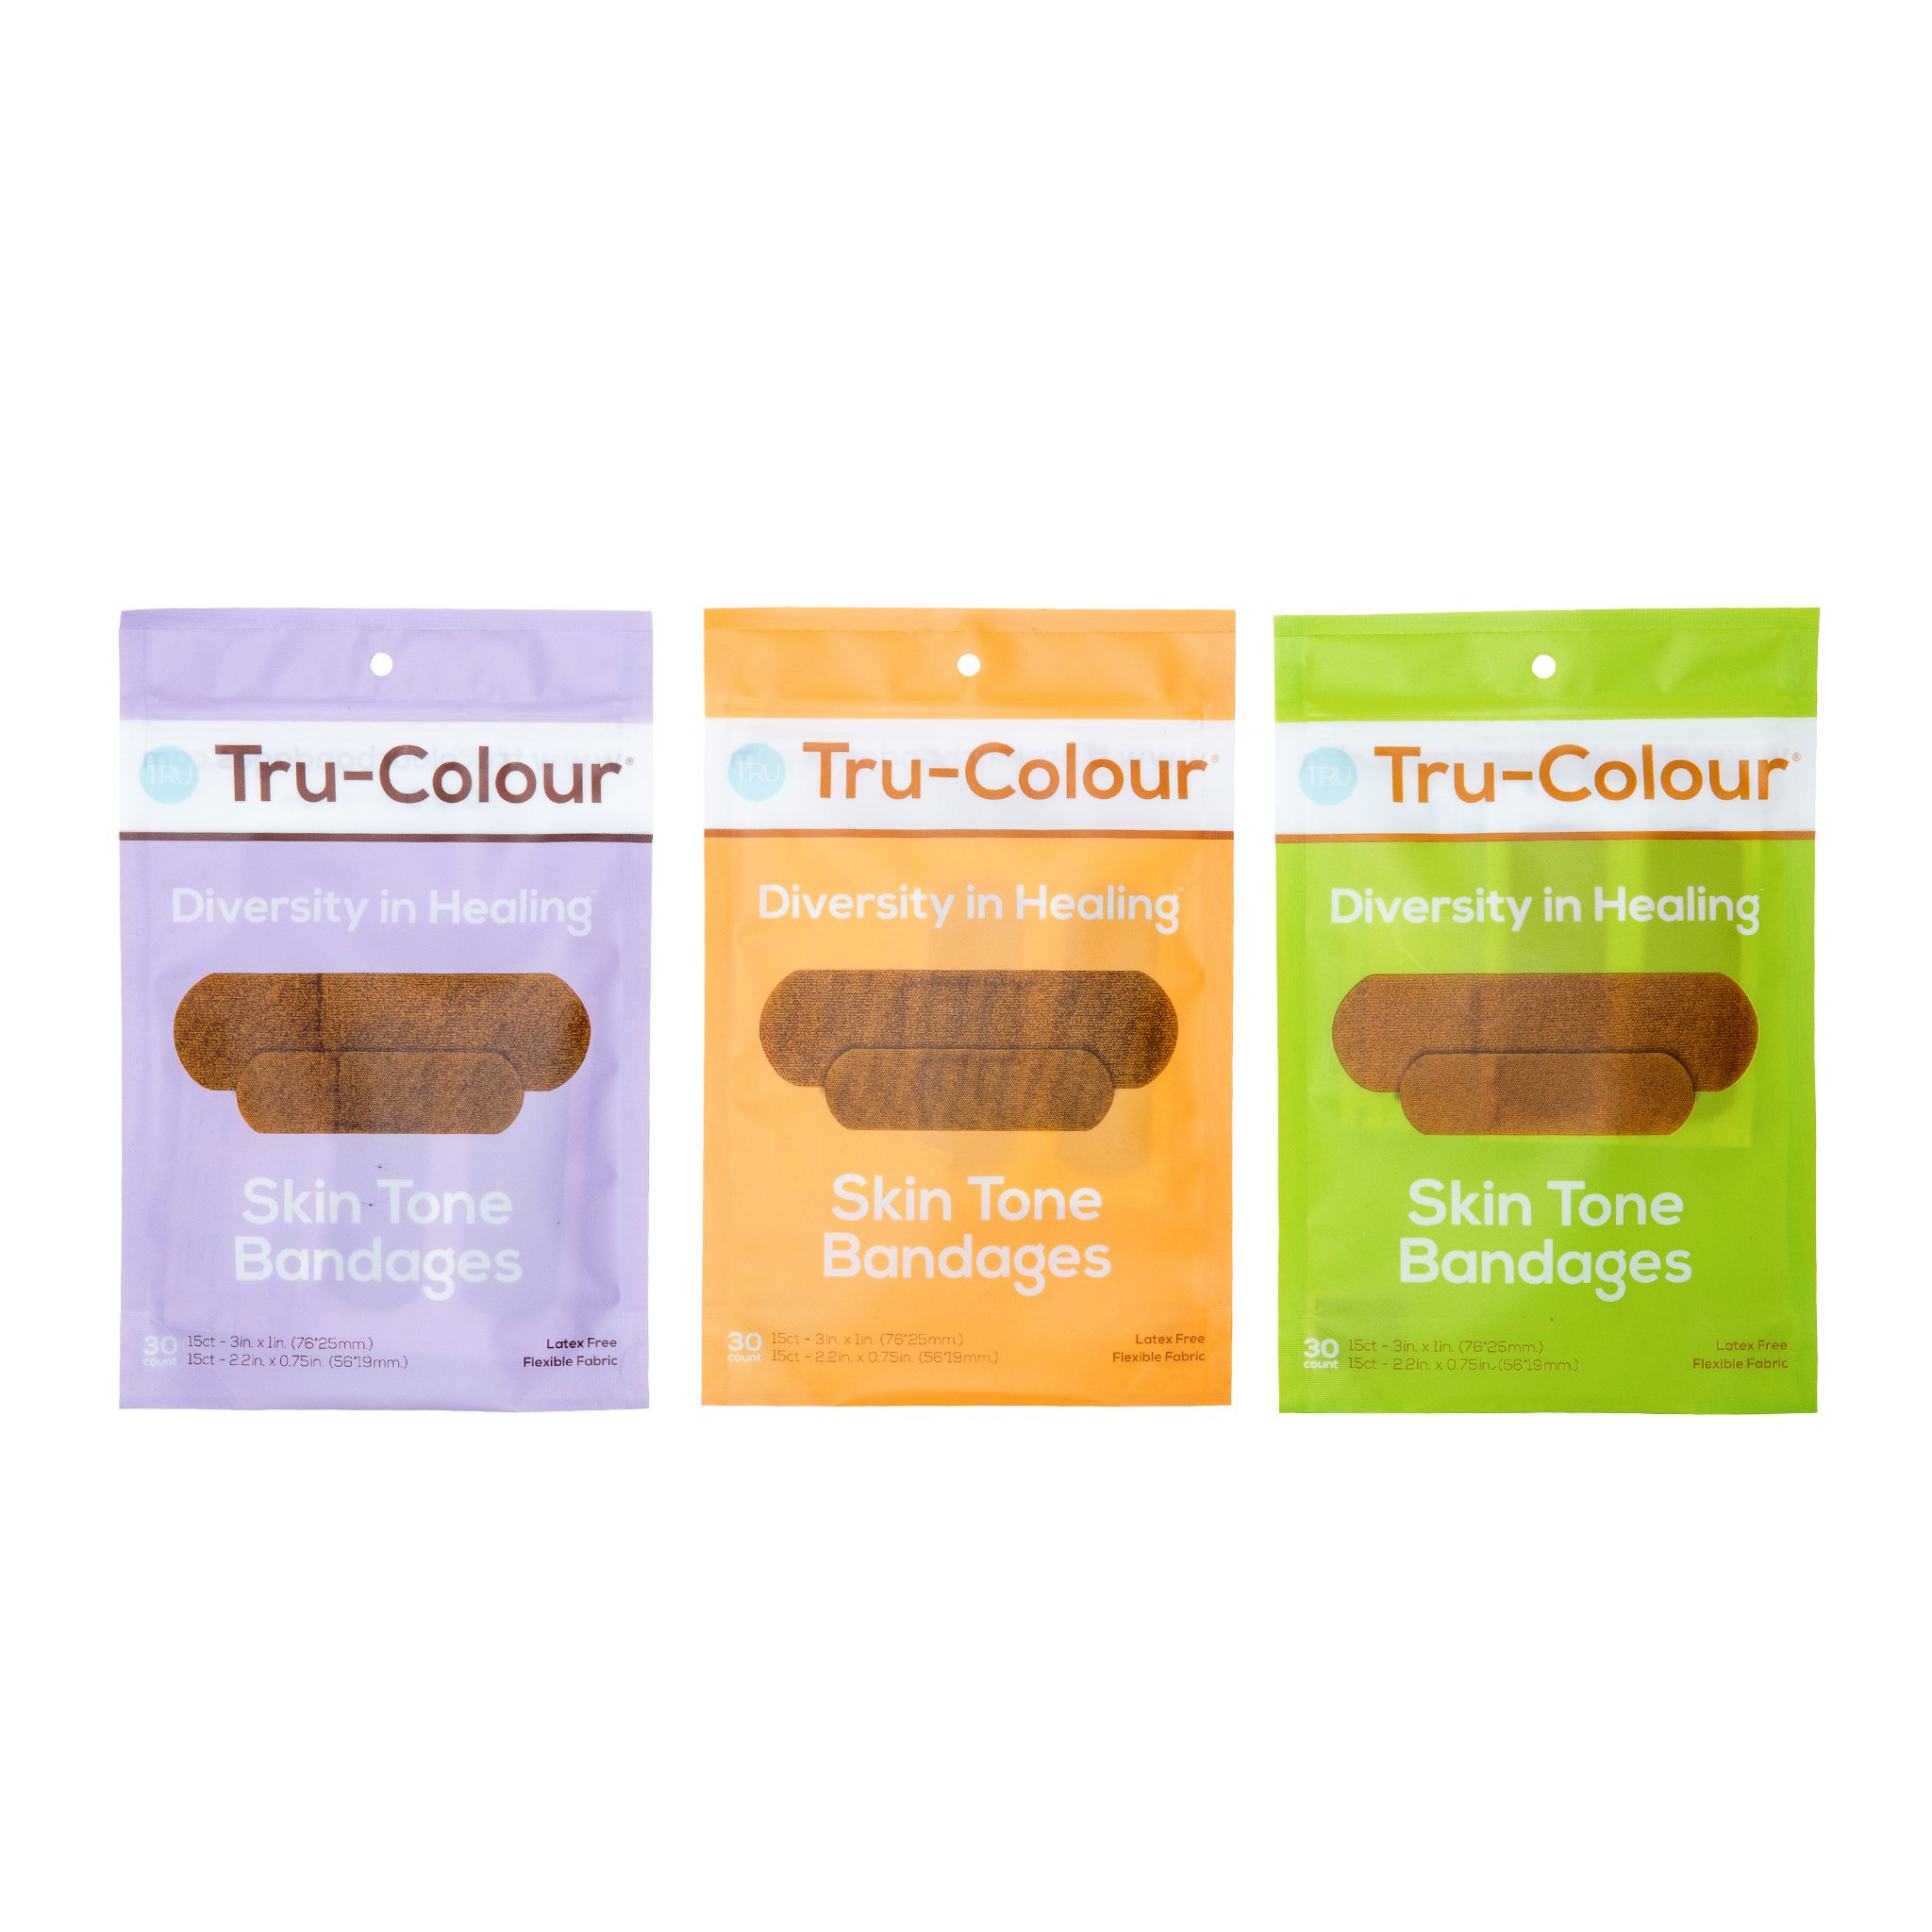 Tru-Colour Bandages Skin Tone Flexible Fabric Bandages Color Combo Pack - 3 Pack (90 Count) by Tru-Colour